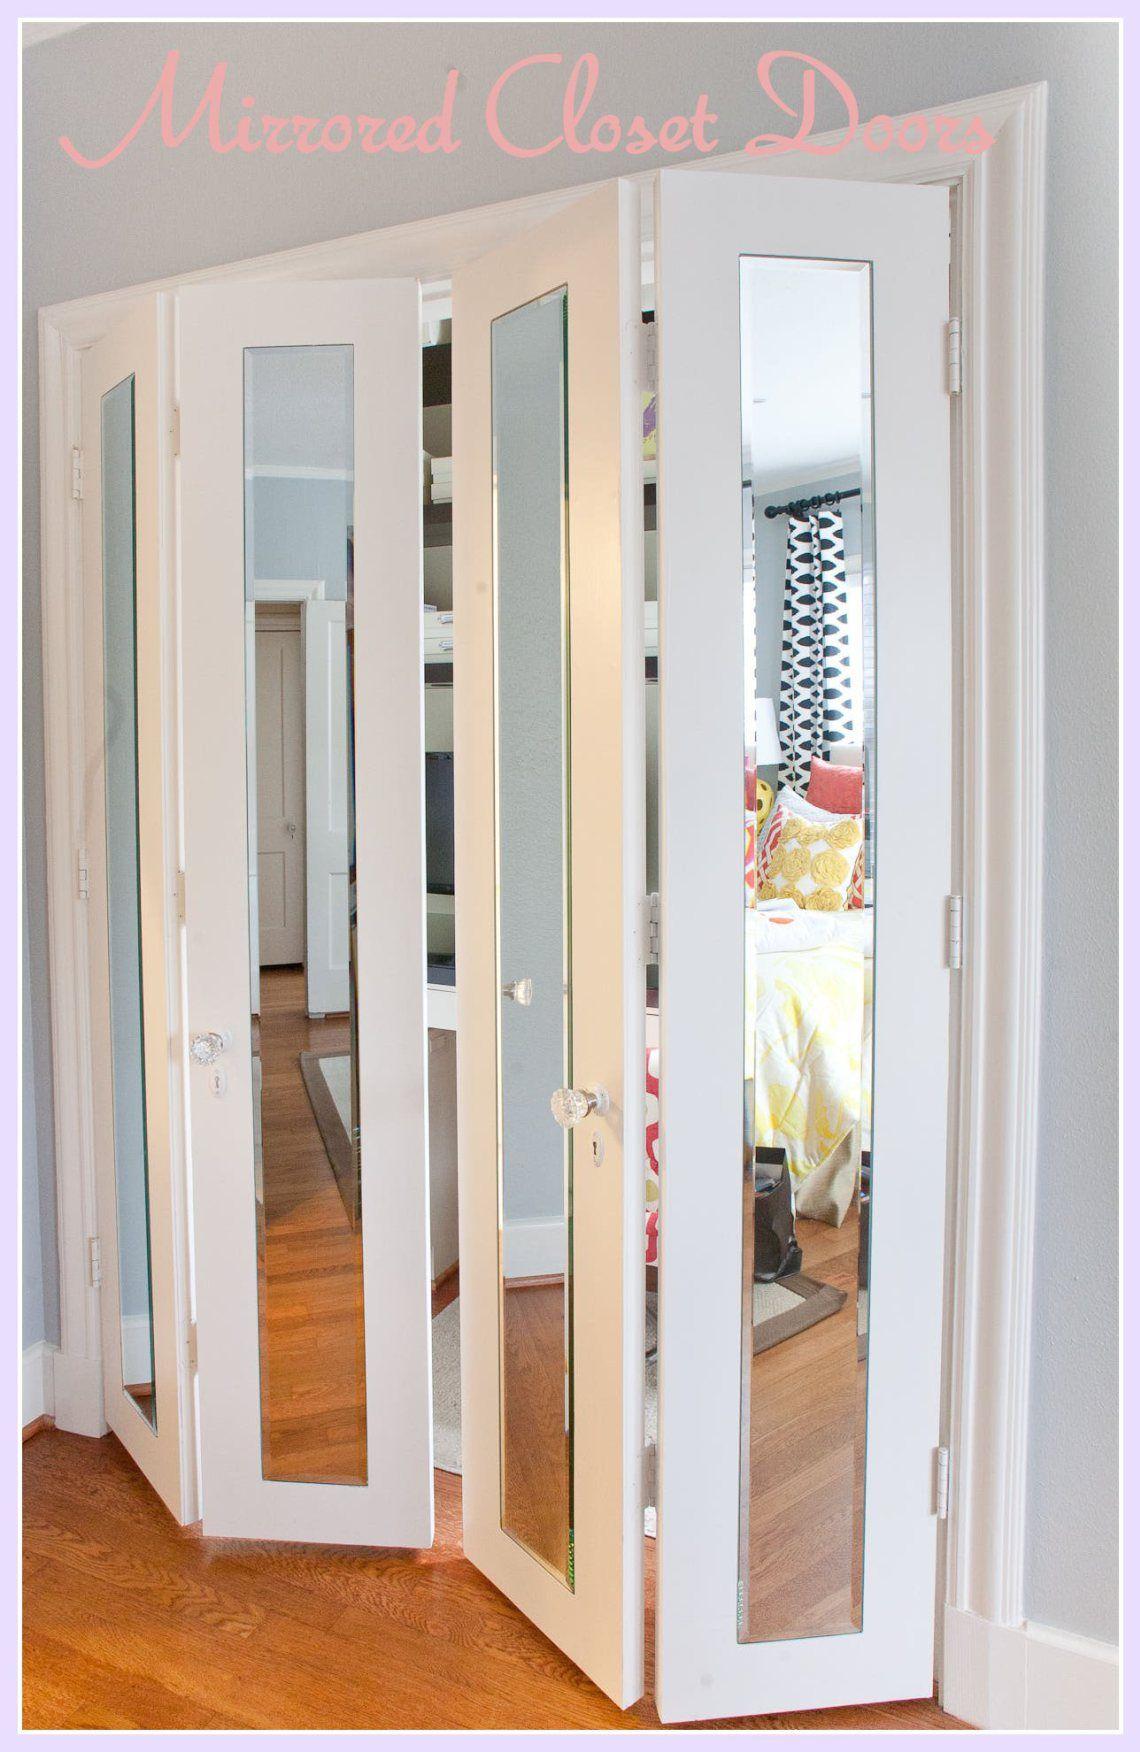 mirror closet doors Home Pinterest